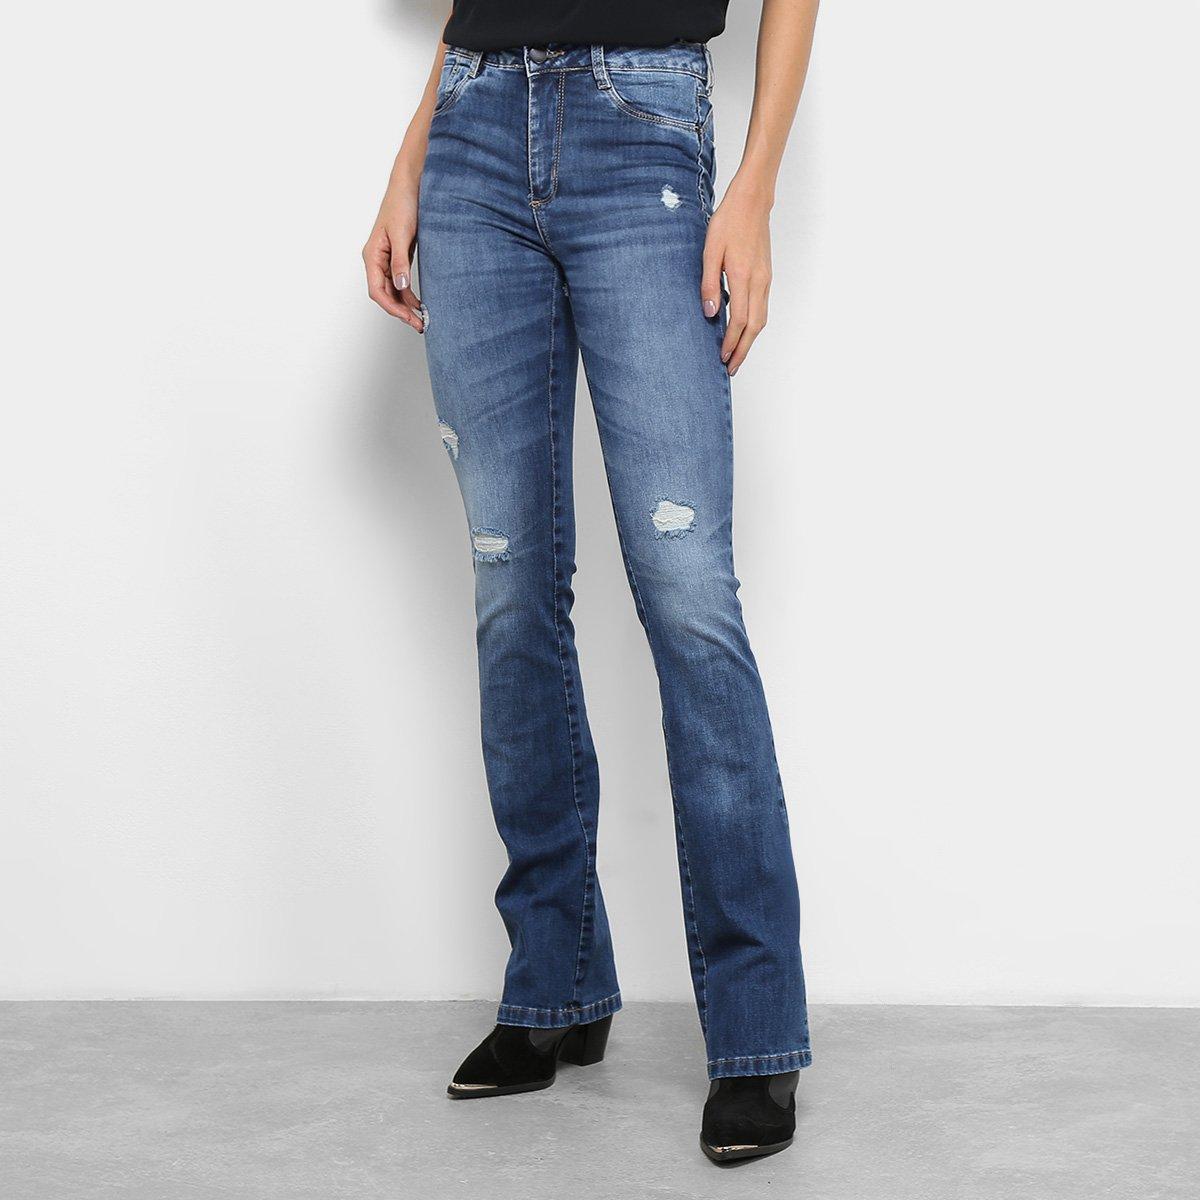 fc10a0bc2 Calça Jeans Flare Sawary Estonada Rasgos Cintura Alta Feminina. undefined